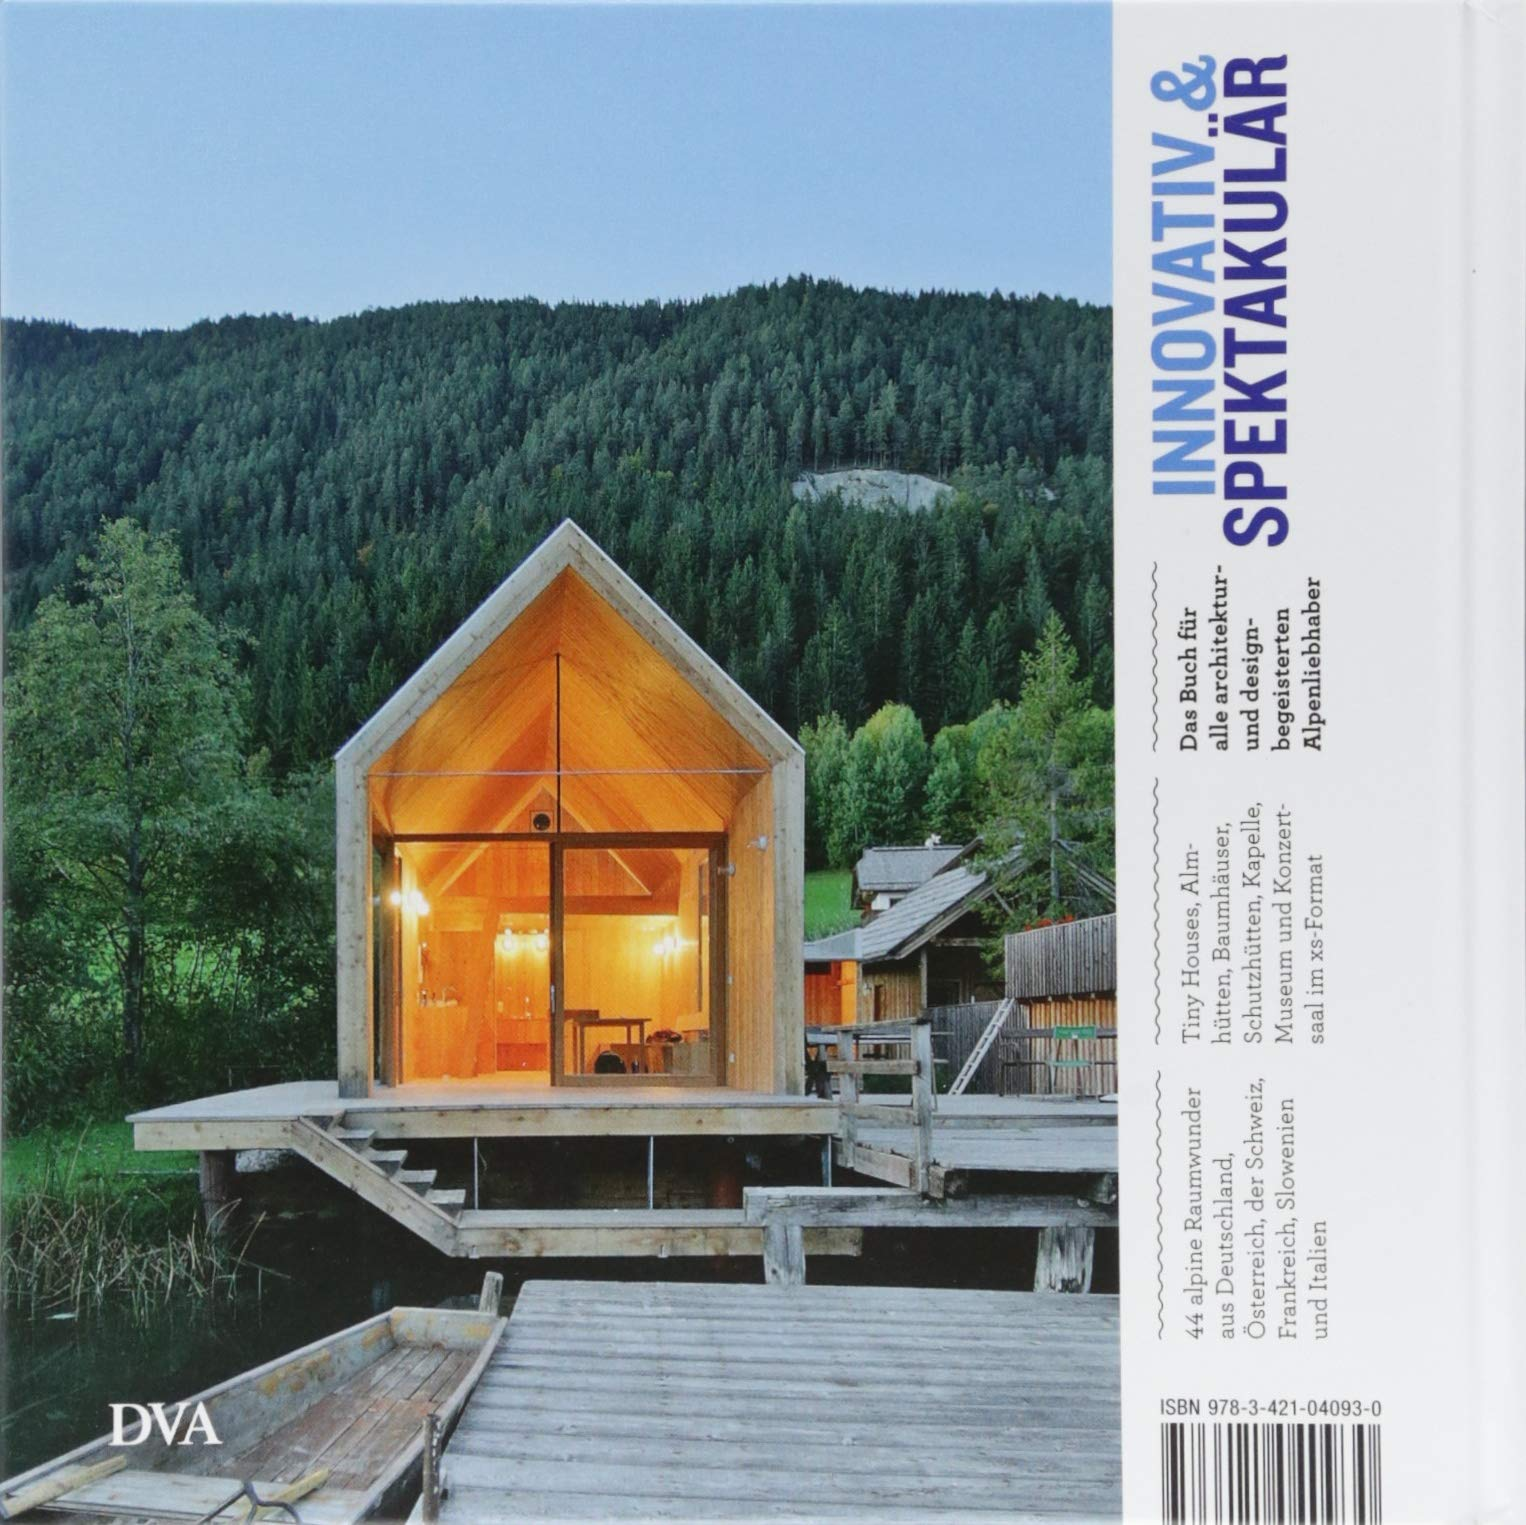 Winzig Alpin Innovative Architektur Im Mini Format Amazon De